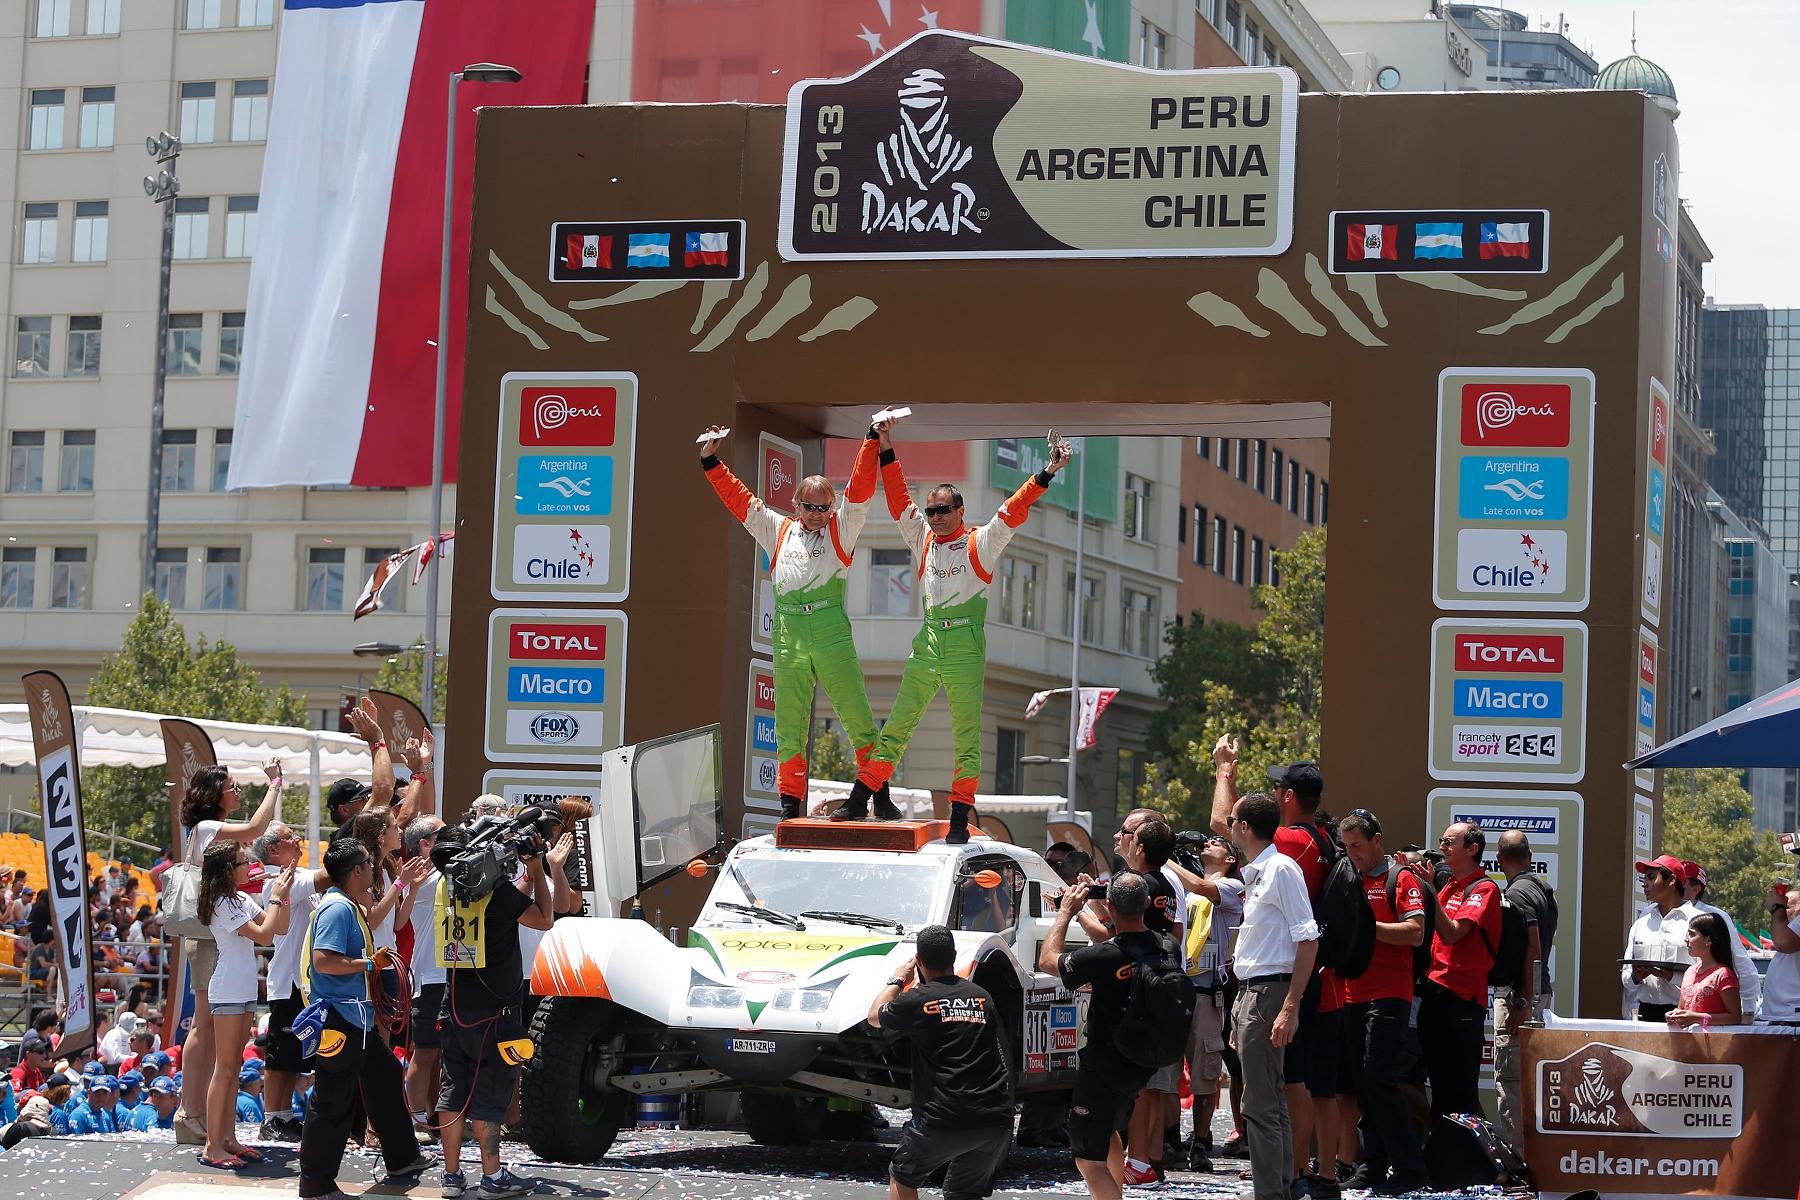 MOTORSPORT - DAKAR PERU CHILE ARGENTINA  2013 - FINISH / ARRIVEE - SANTIAGO (CHI) - 19/01/2013 - PHOTO :  FRANÇOIS FLAMAND / DPPI -  CHABOT RONAN ( FRANCE ) - SMG - TOYS MOTORS - SMG - AMBIANCE - PORTRAIT PODIUM